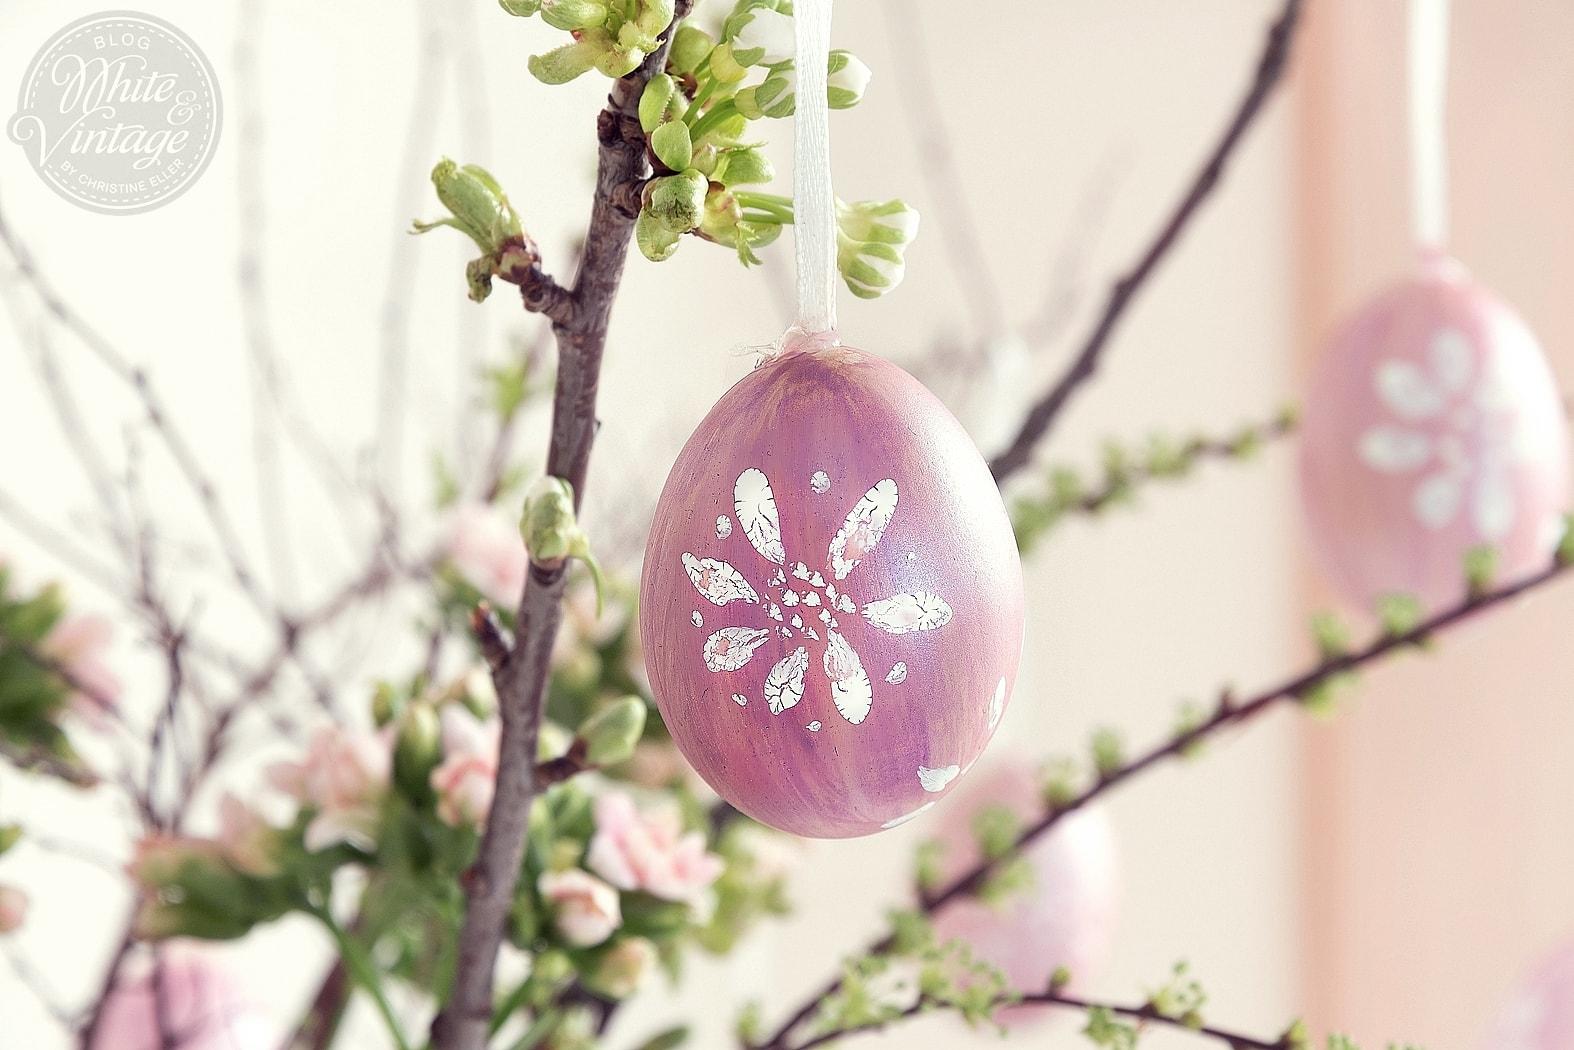 Ostereier mit Aquarellfarben bemalen. Osterstrauß dekorieren.